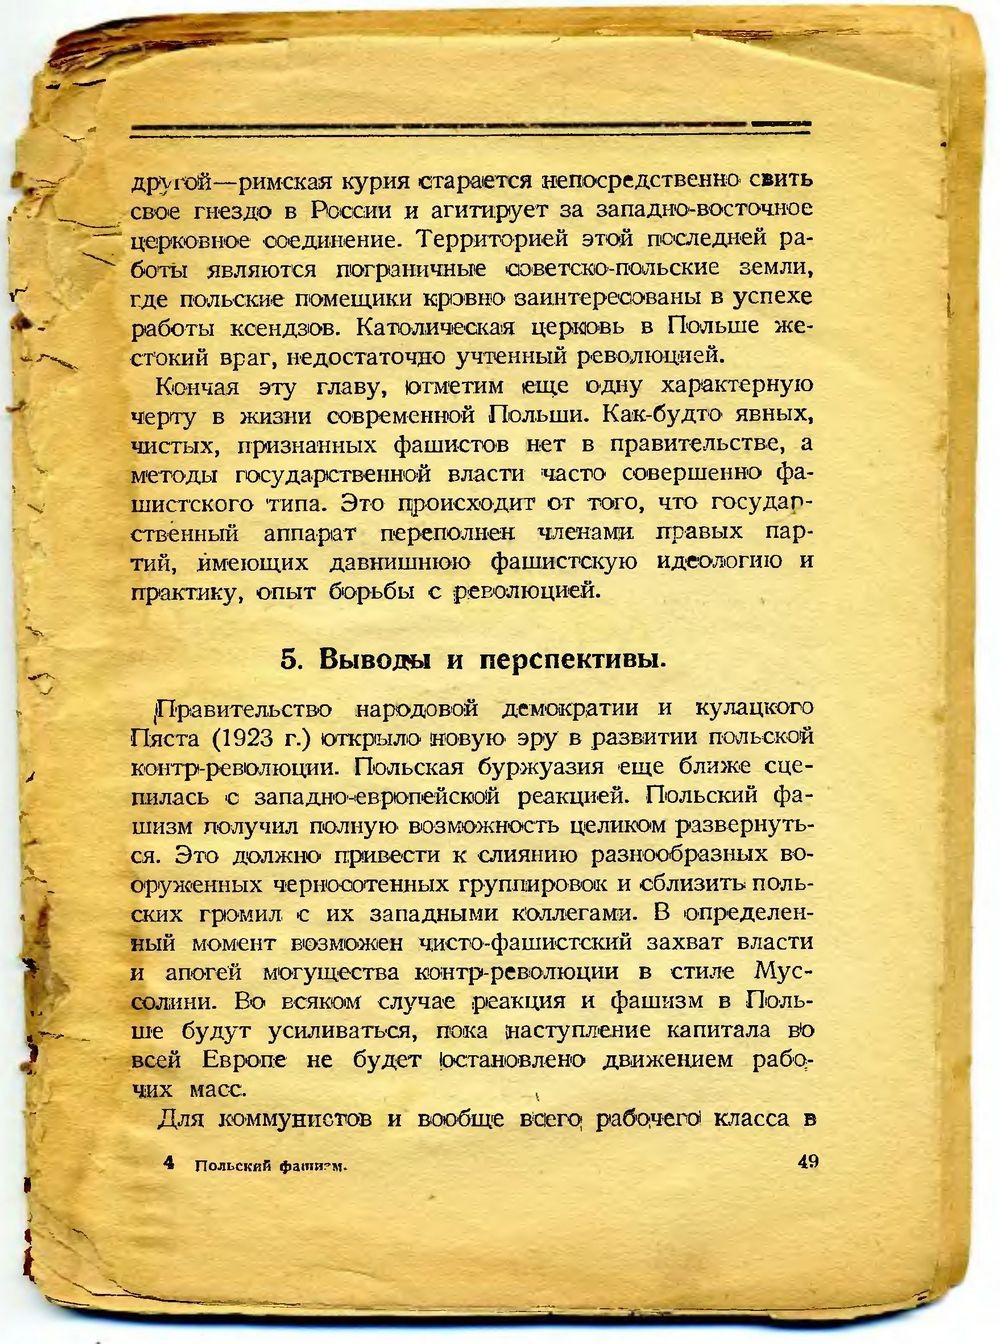 http://i5.imageban.ru/out/2014/01/20/c5c603caa907da5b595700d723c8a217.jpg